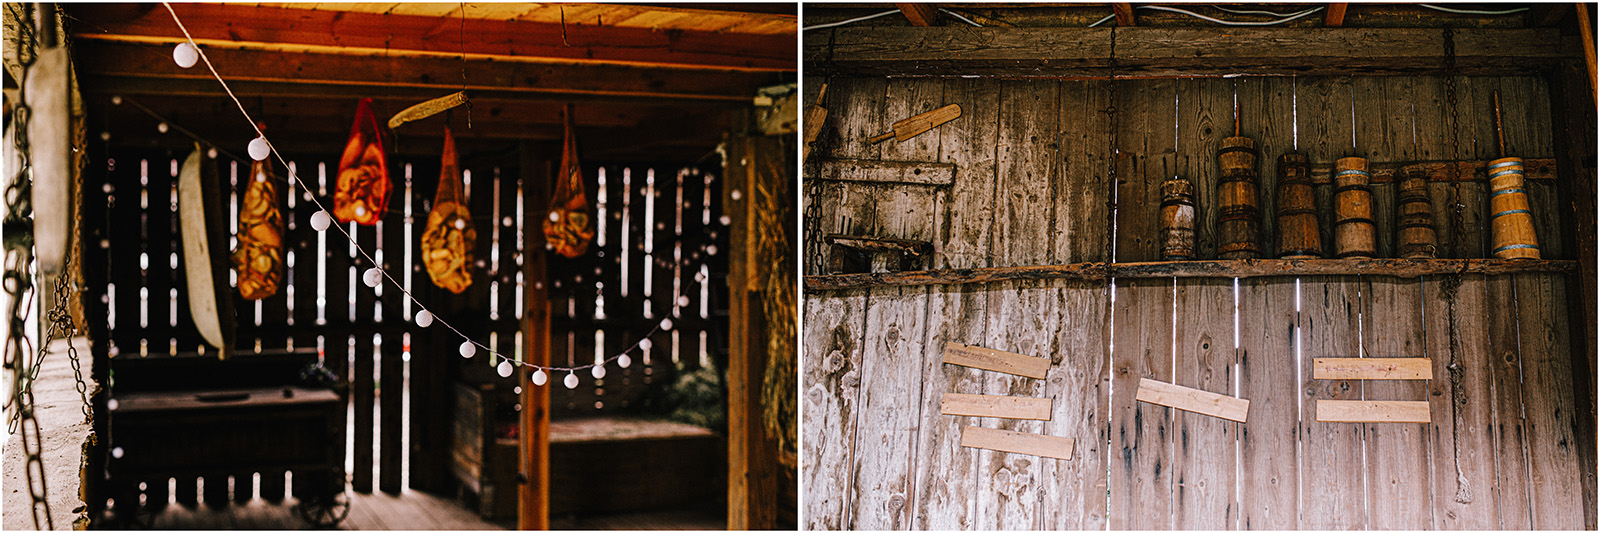 Agatka & Mati | garden party i impreza w stodole 21